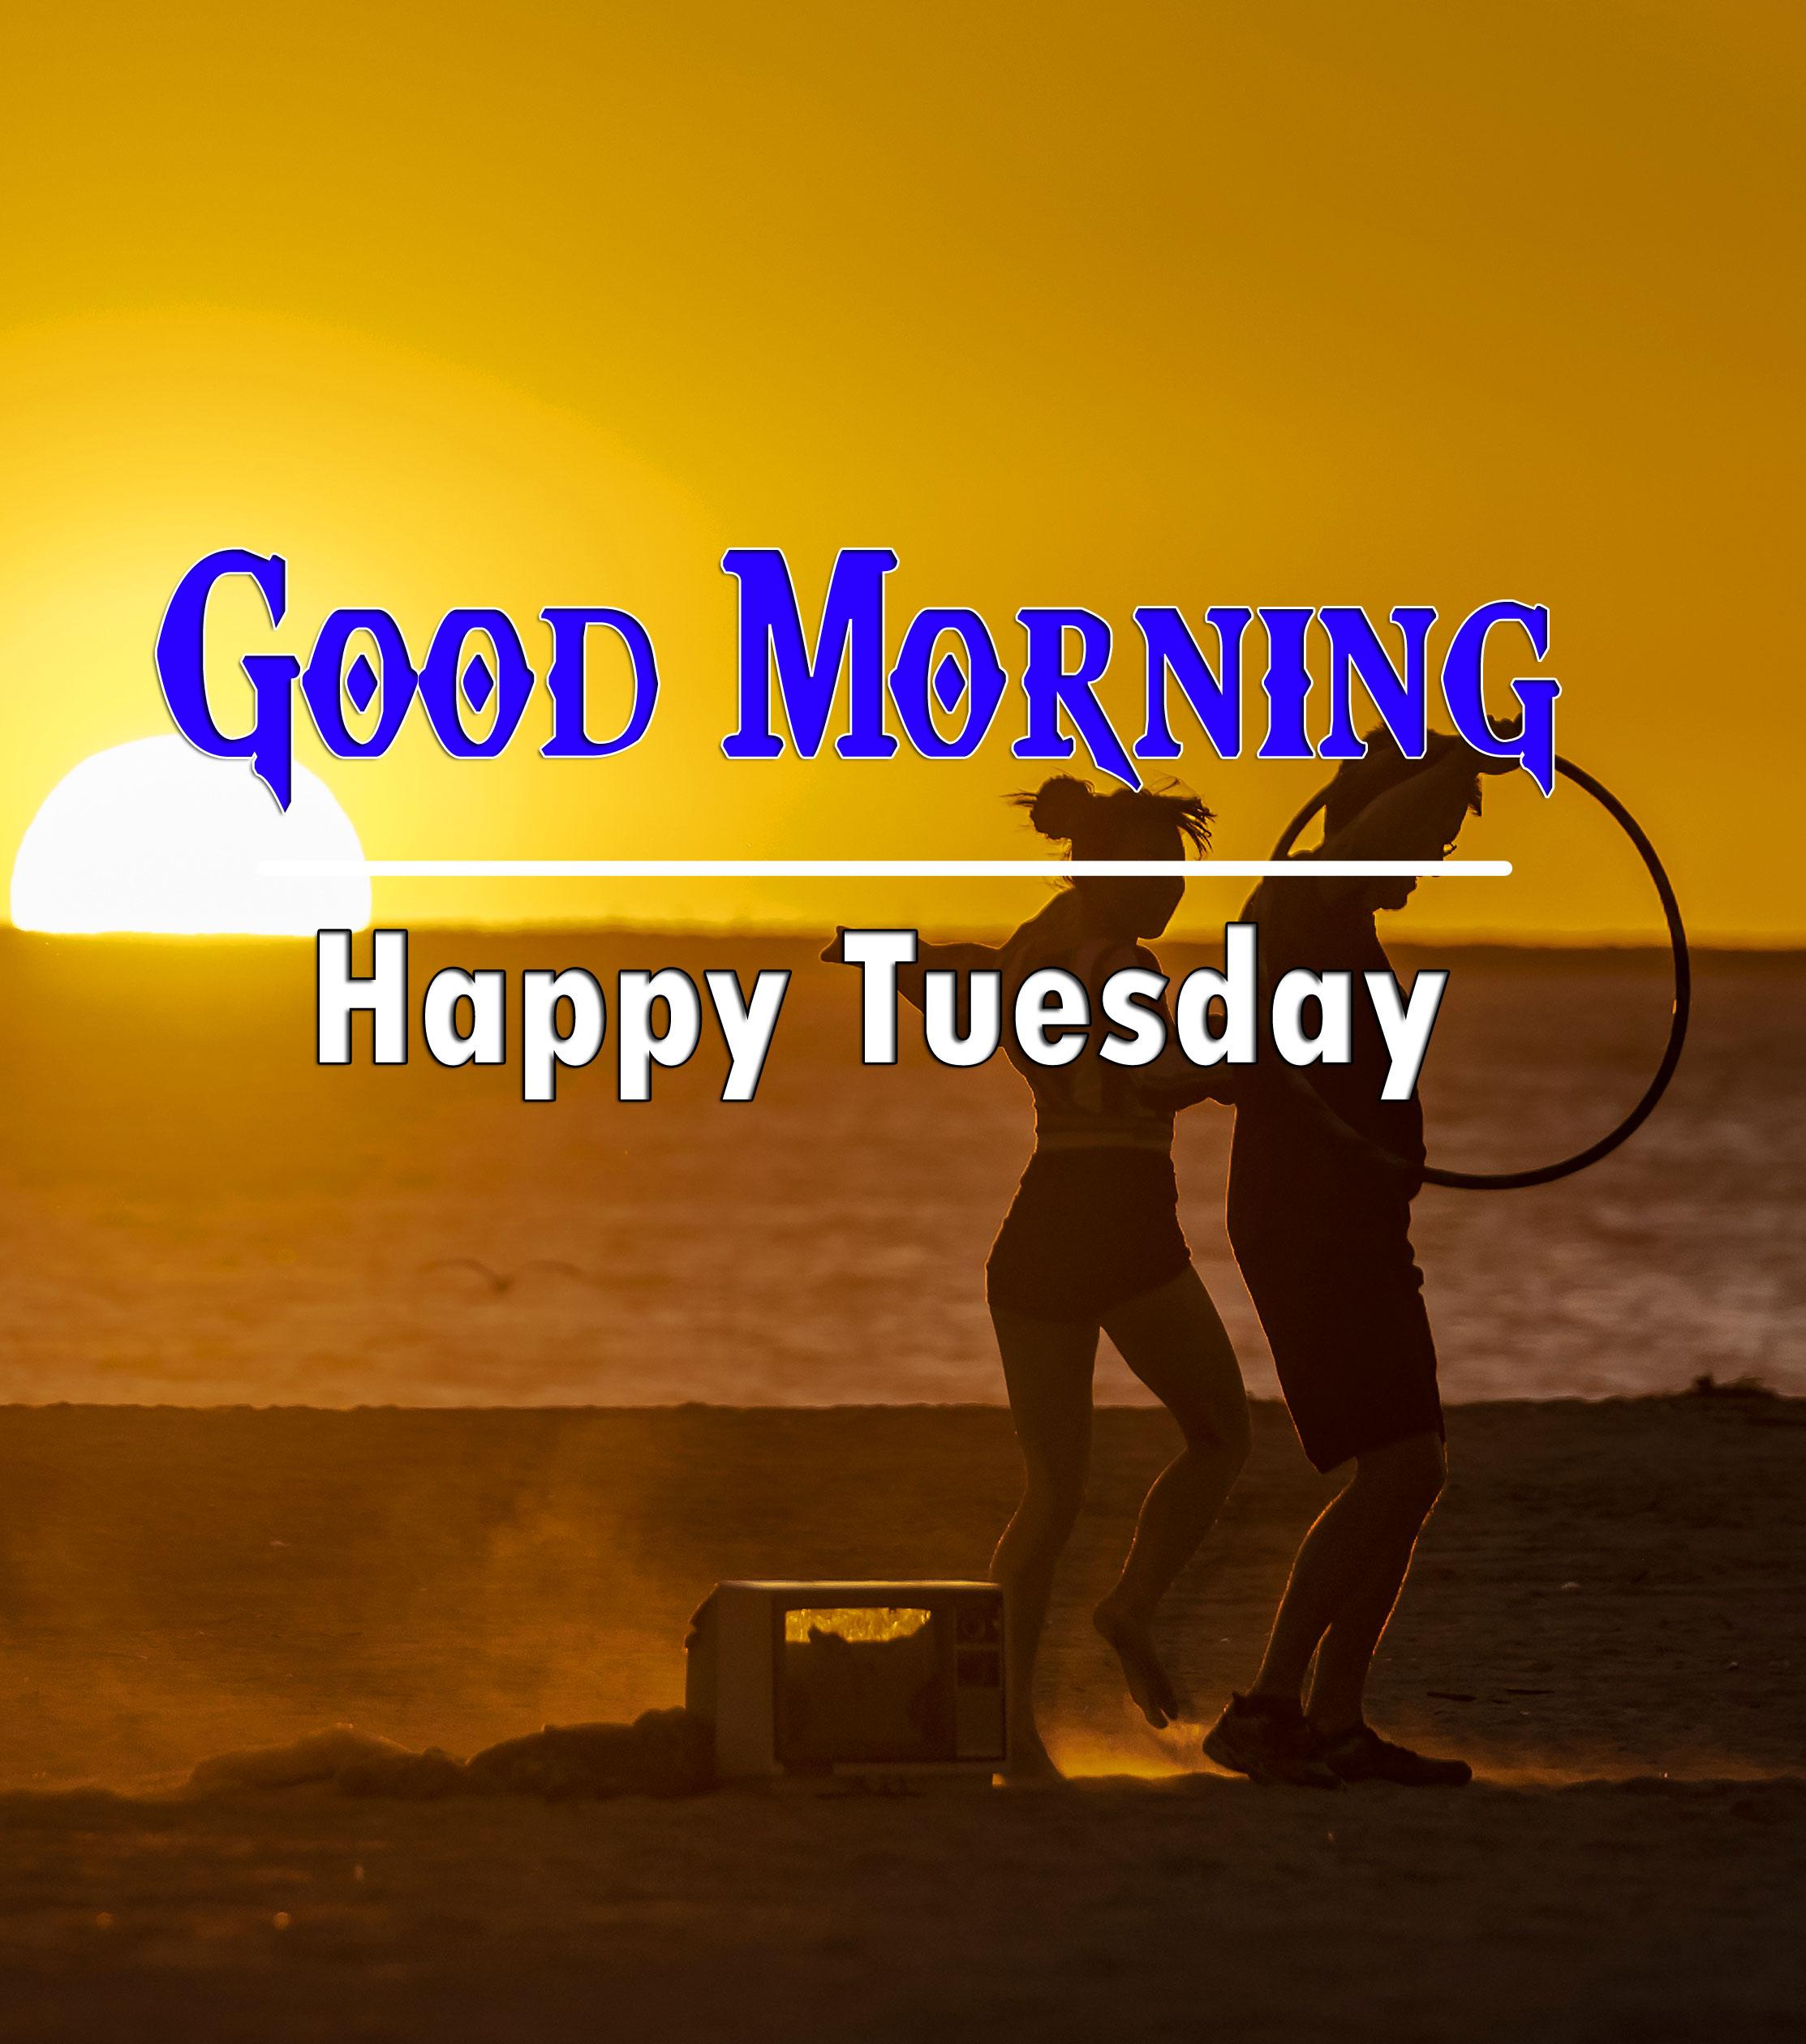 Tuesday Good morning Wallpaper 2021 4